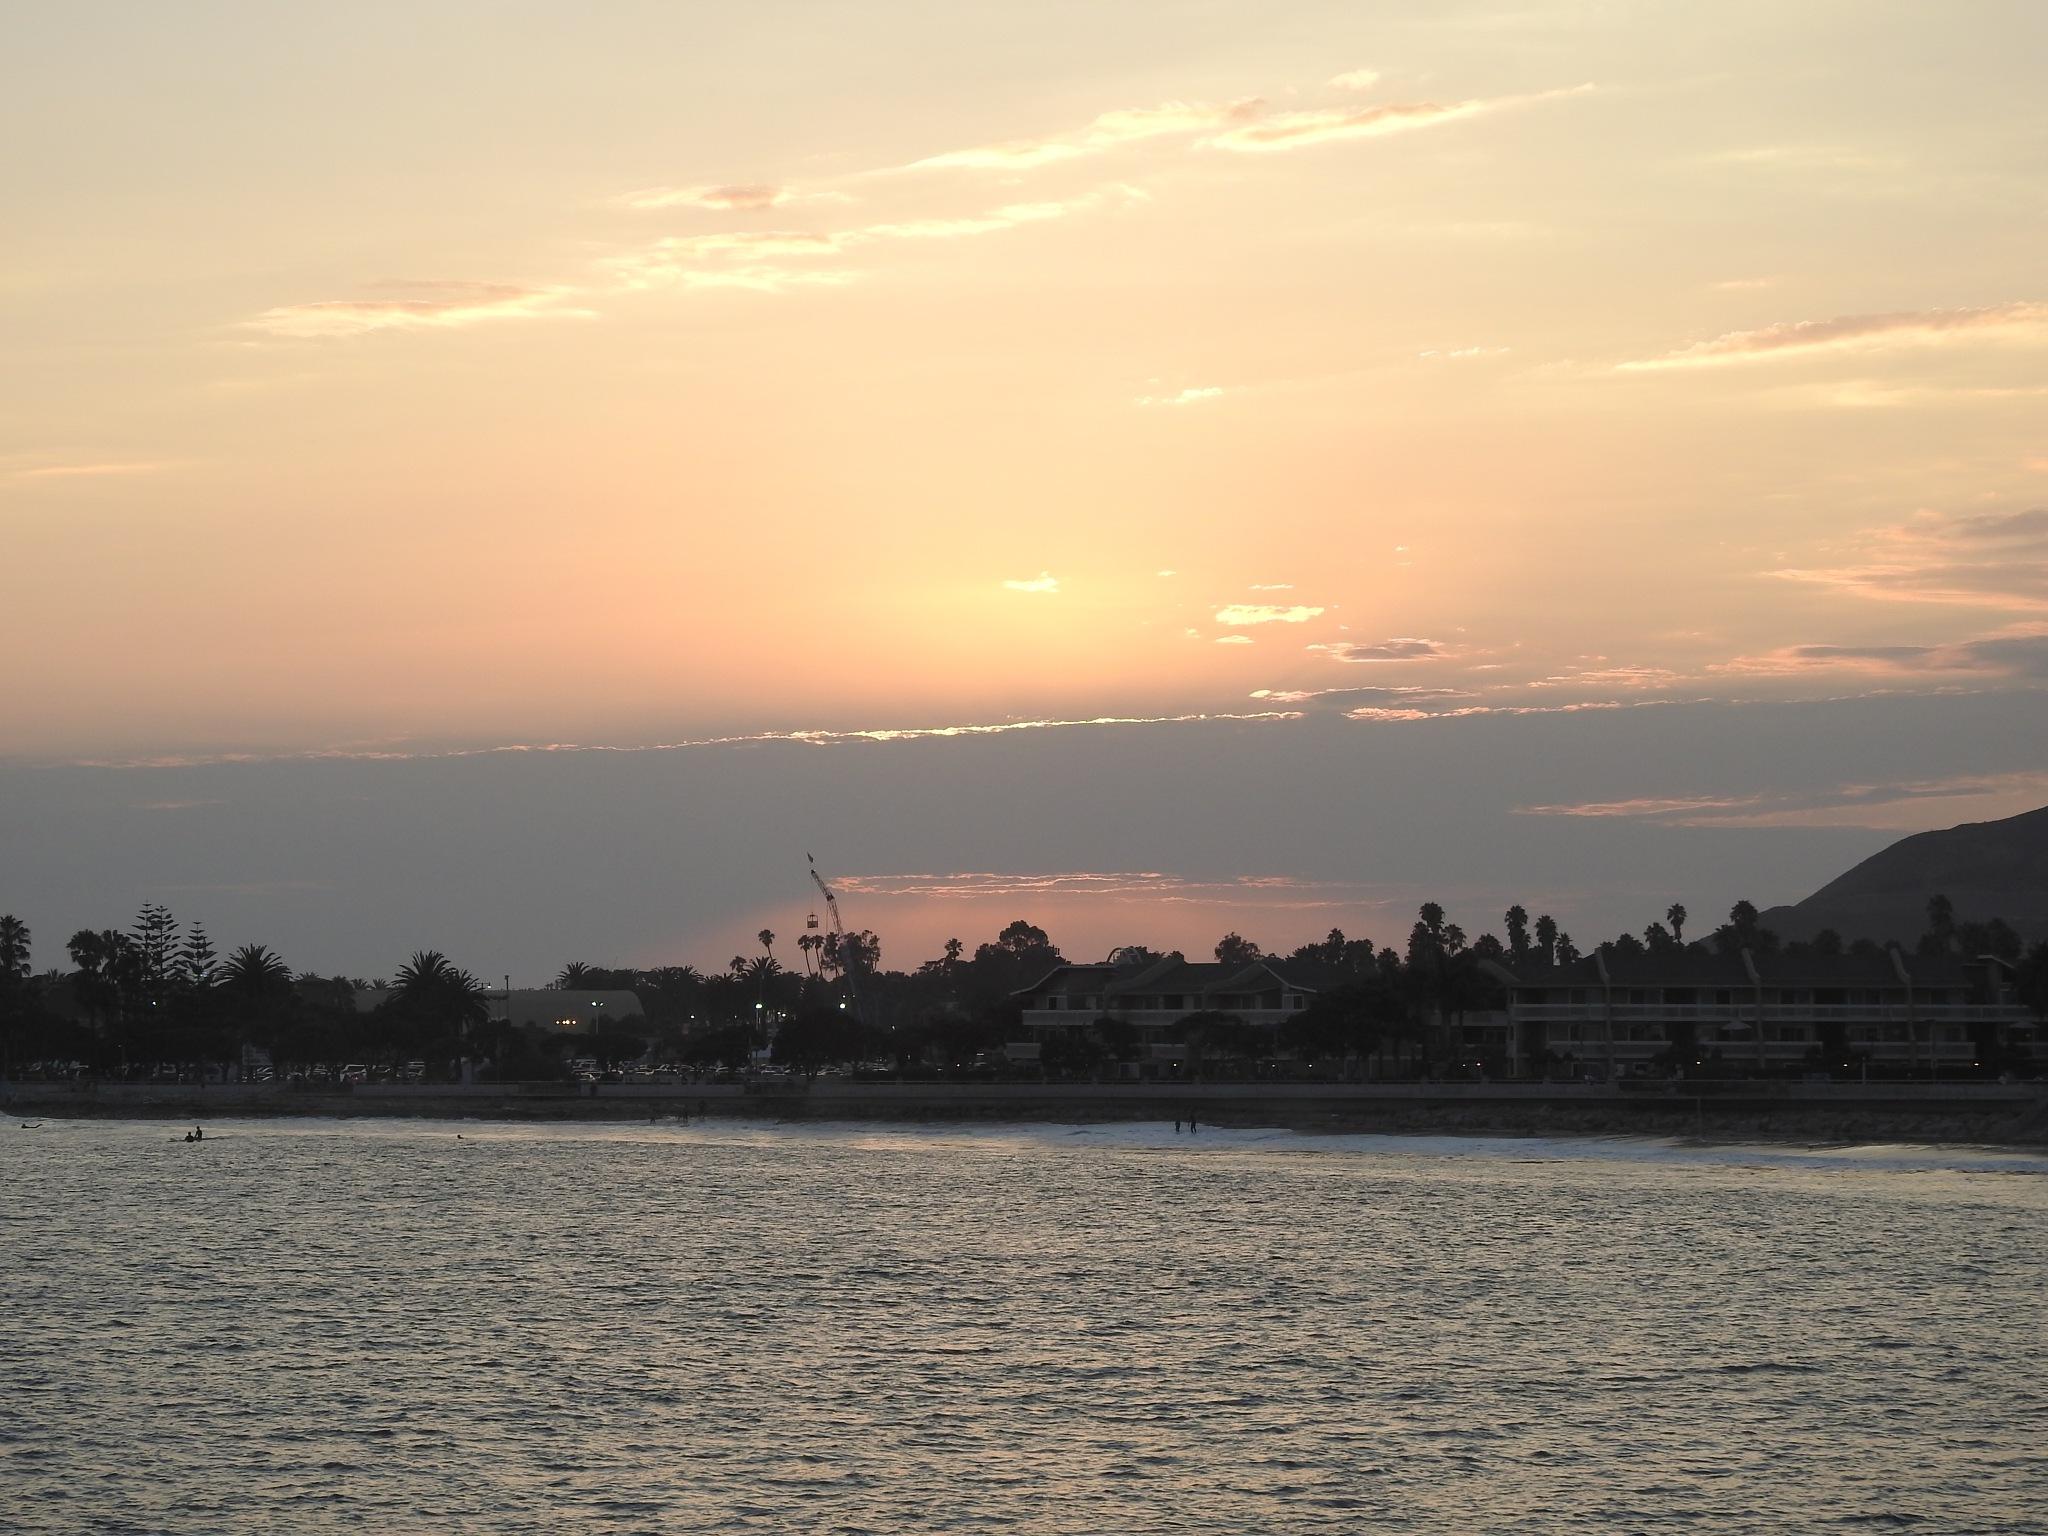 sunset beach by Bobby Zimmerman